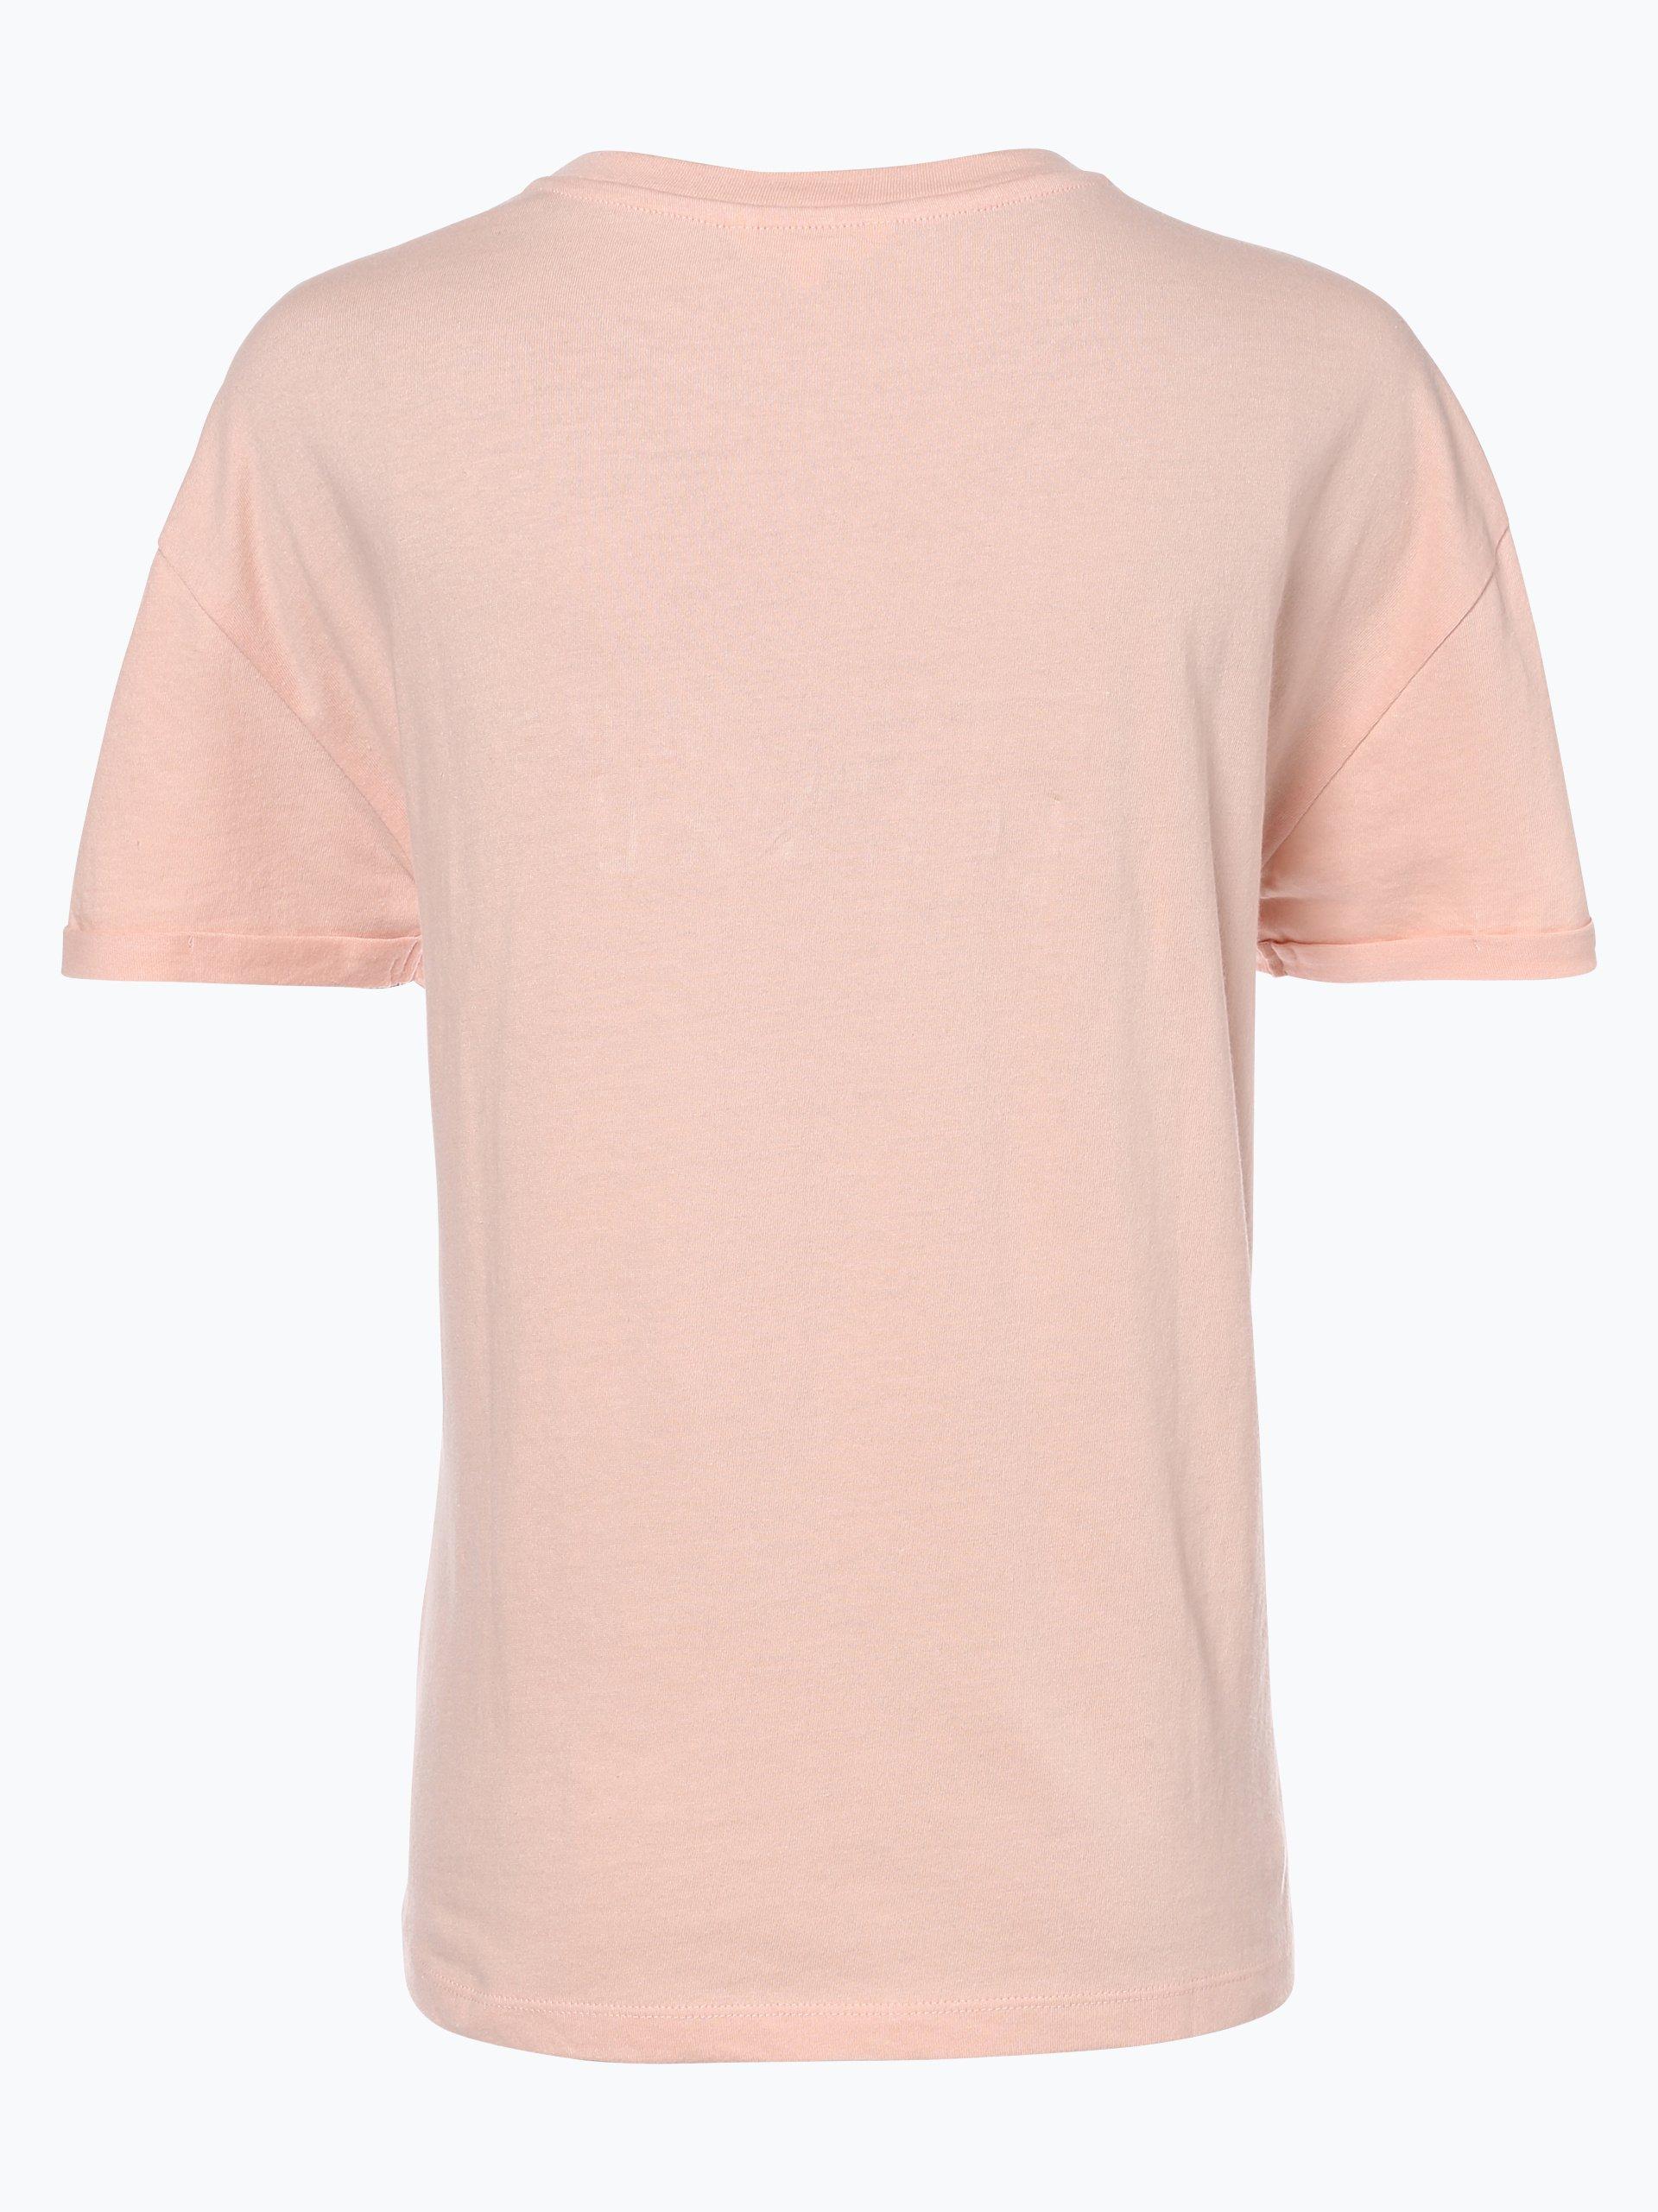 review damen t shirt rosa gemustert online kaufen peek. Black Bedroom Furniture Sets. Home Design Ideas